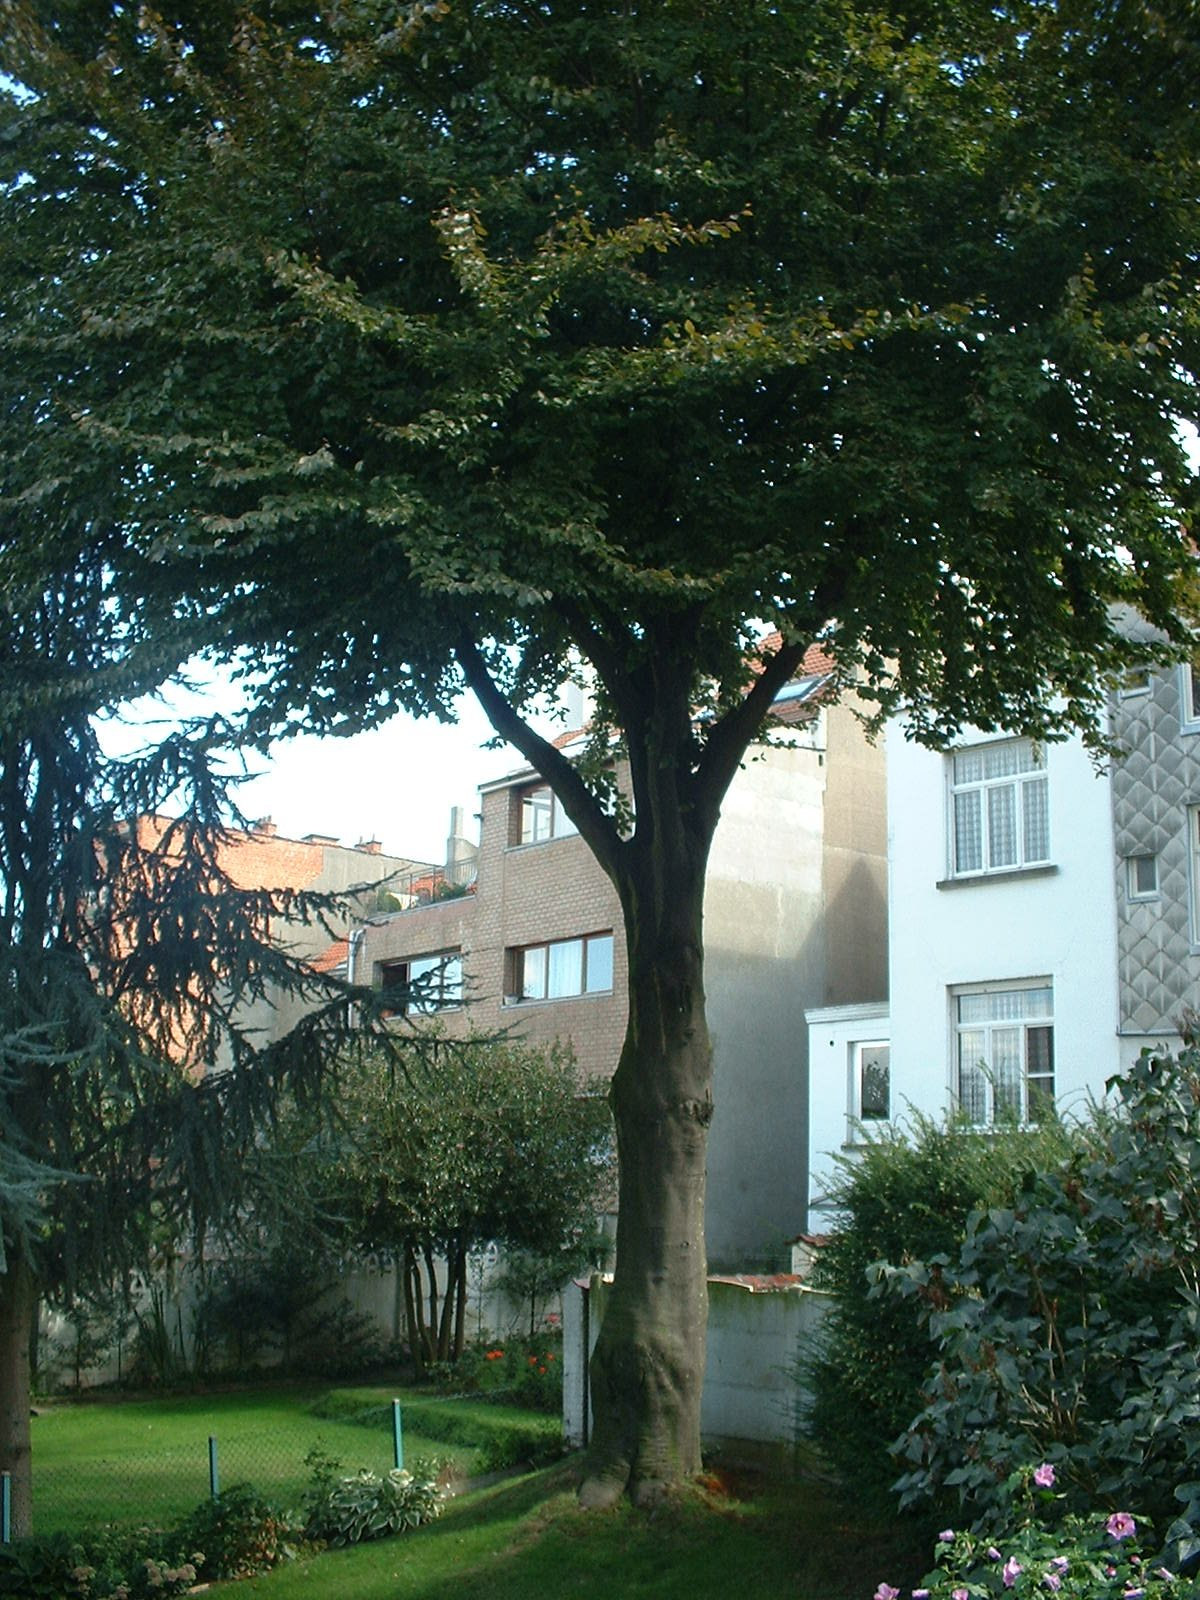 Hêtre pourpre – Ganshoren, Avenue Van Overbeke, 34 –  11 Septembre 2003